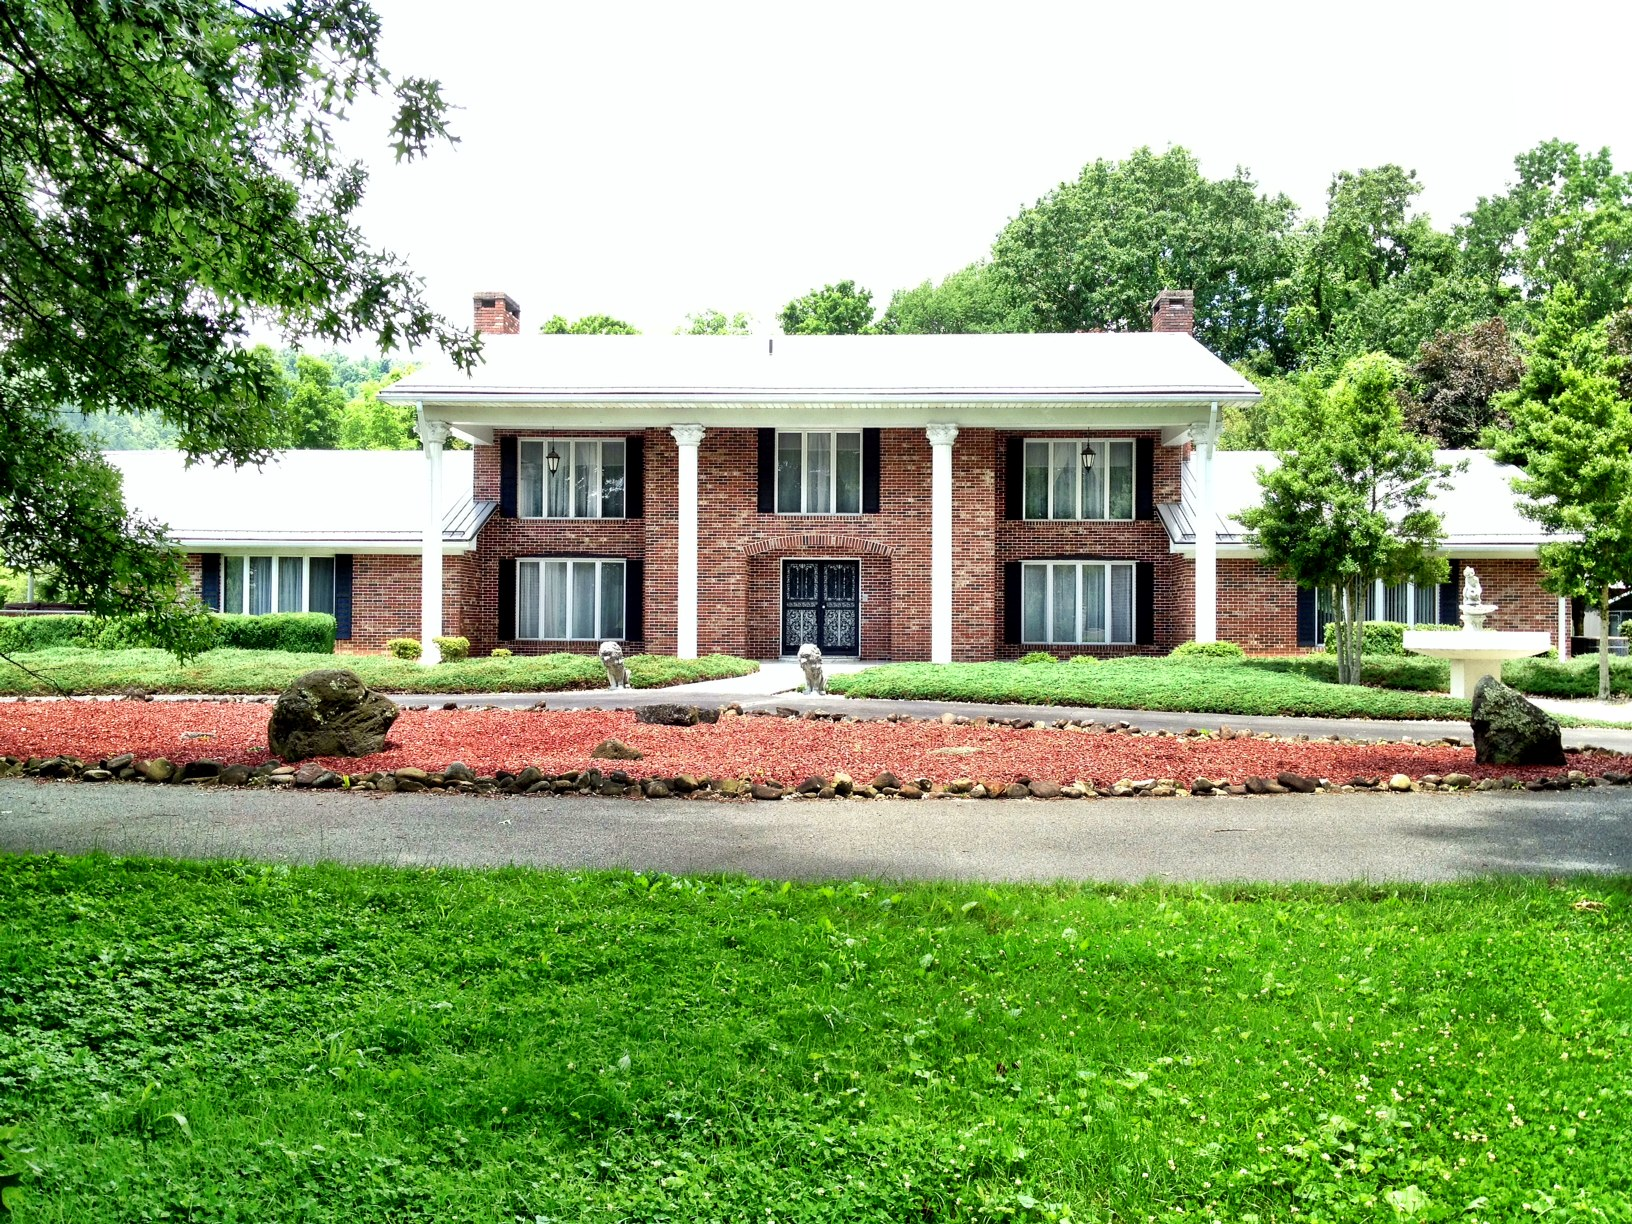 142 Wise Mountain Road, Coeburn, Virginia 24230